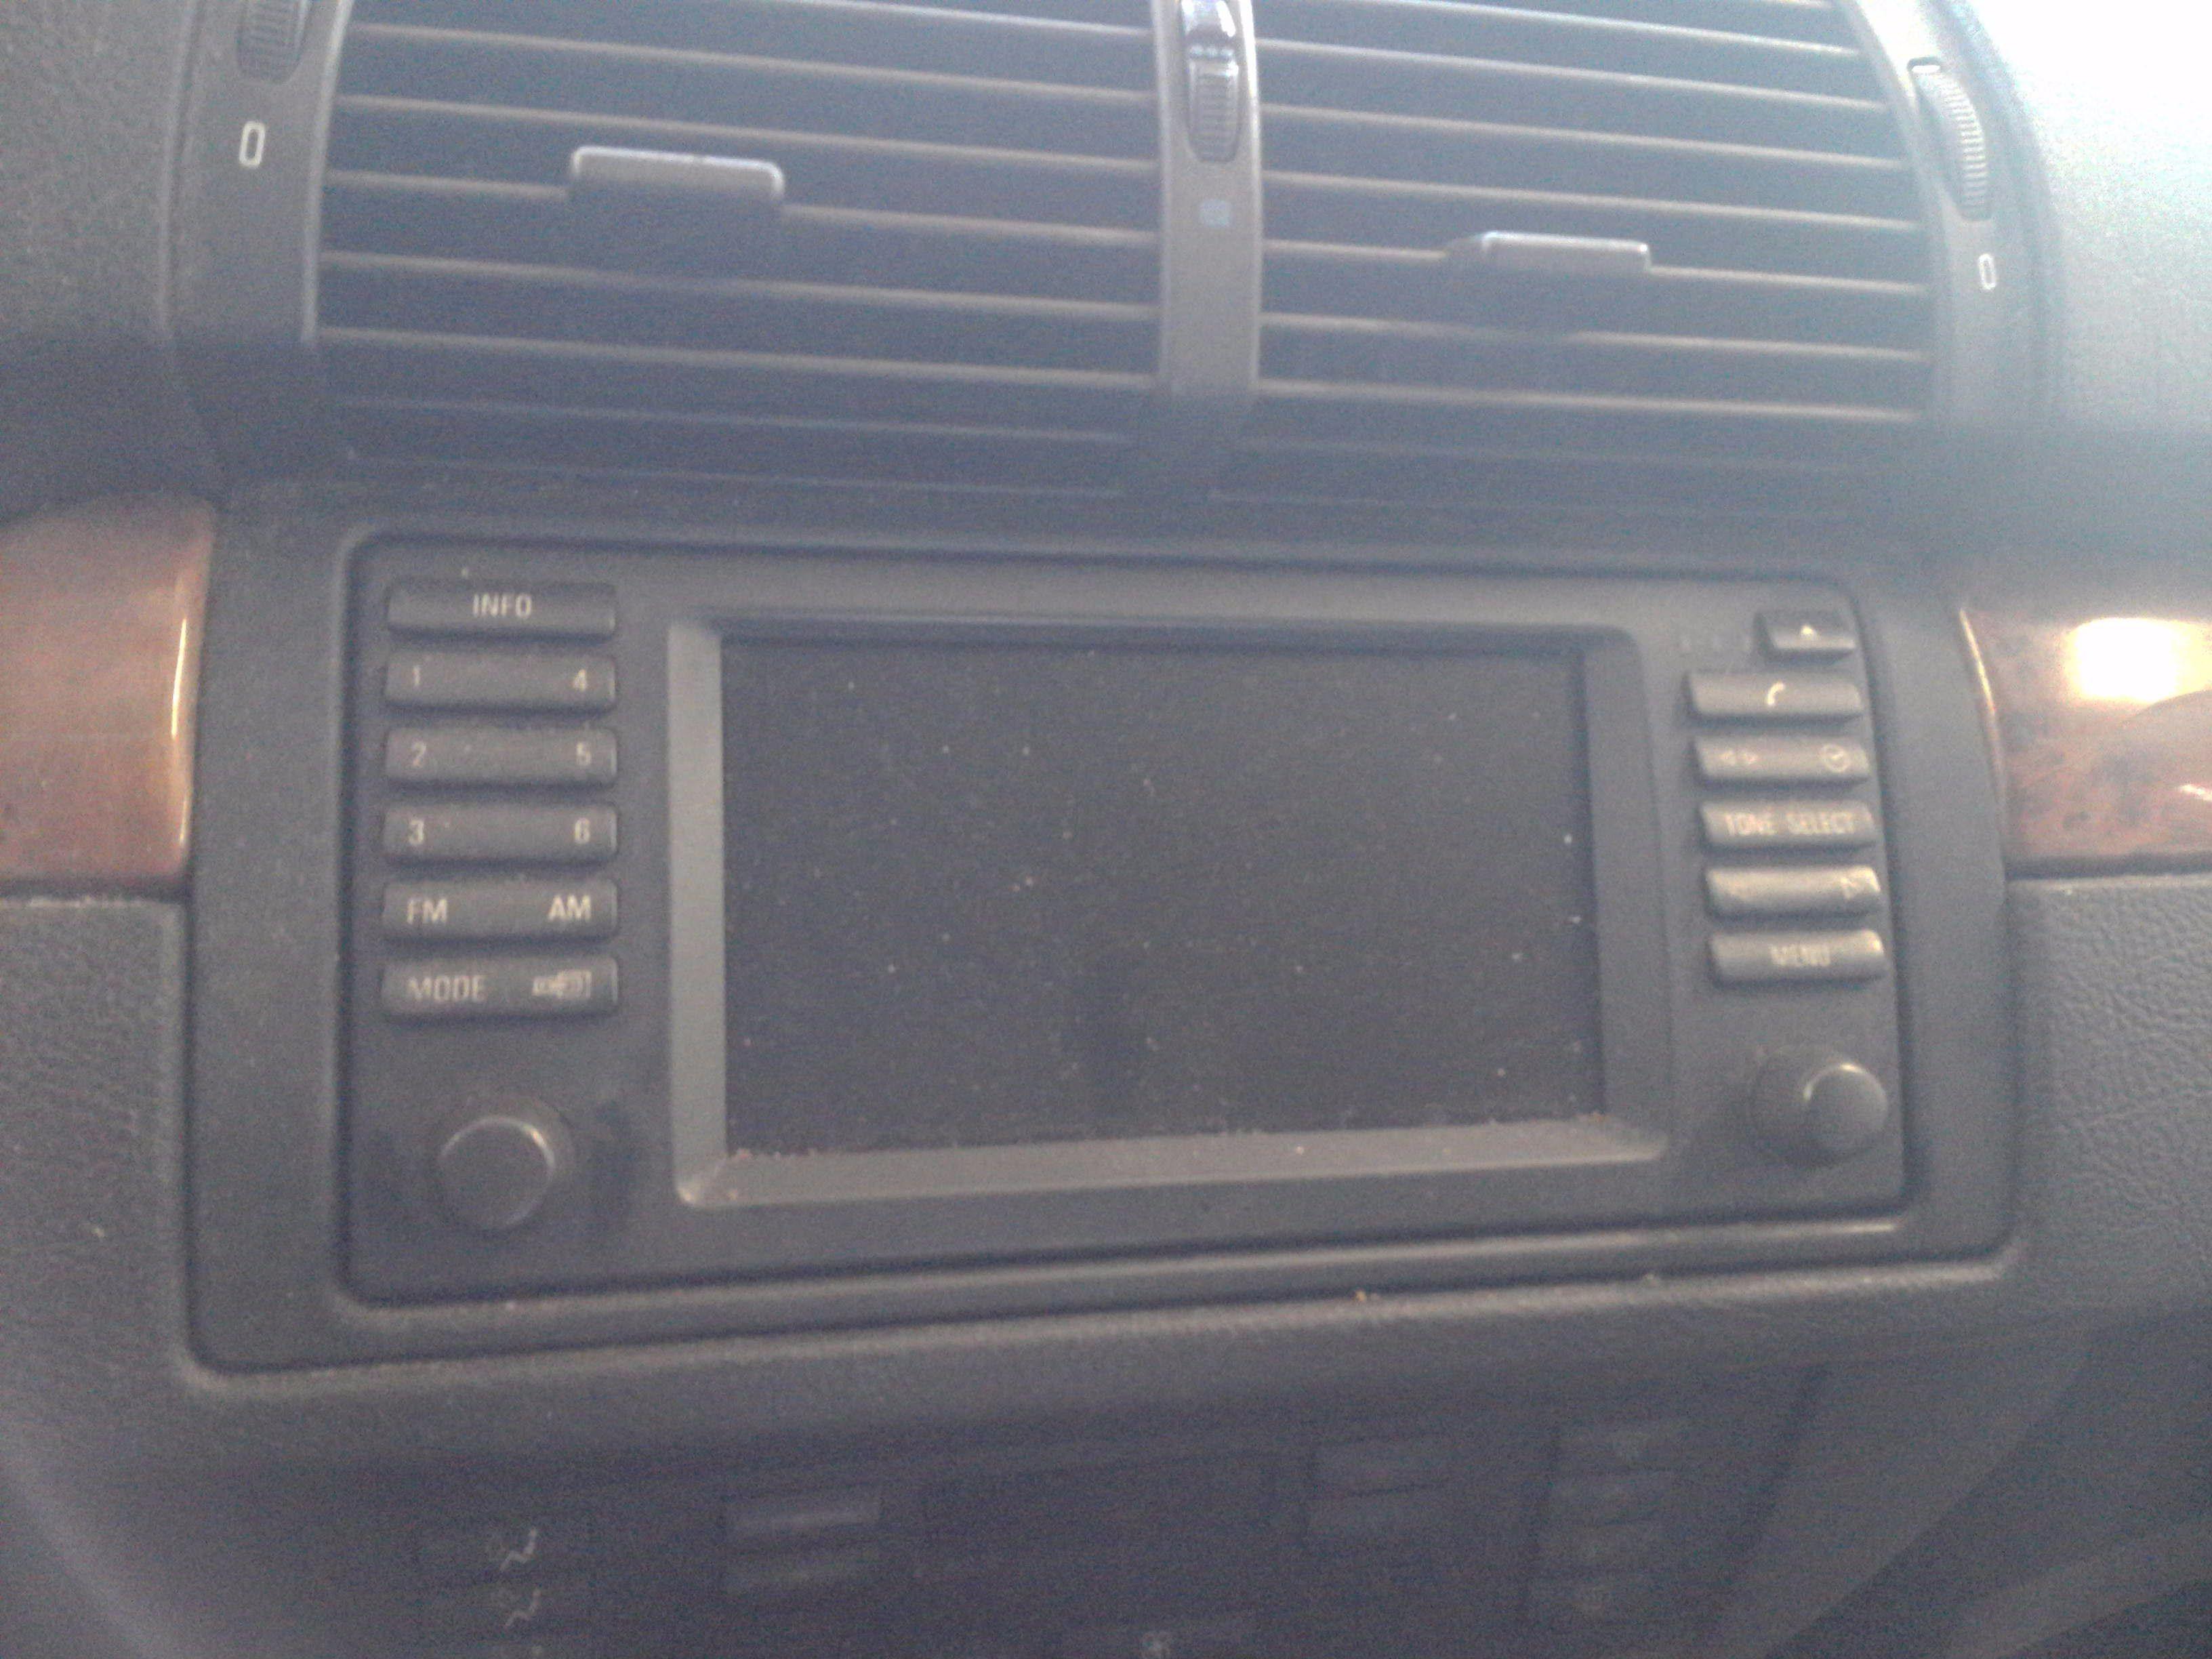 Bmw X5 Stereo Radio Used Auto Parts